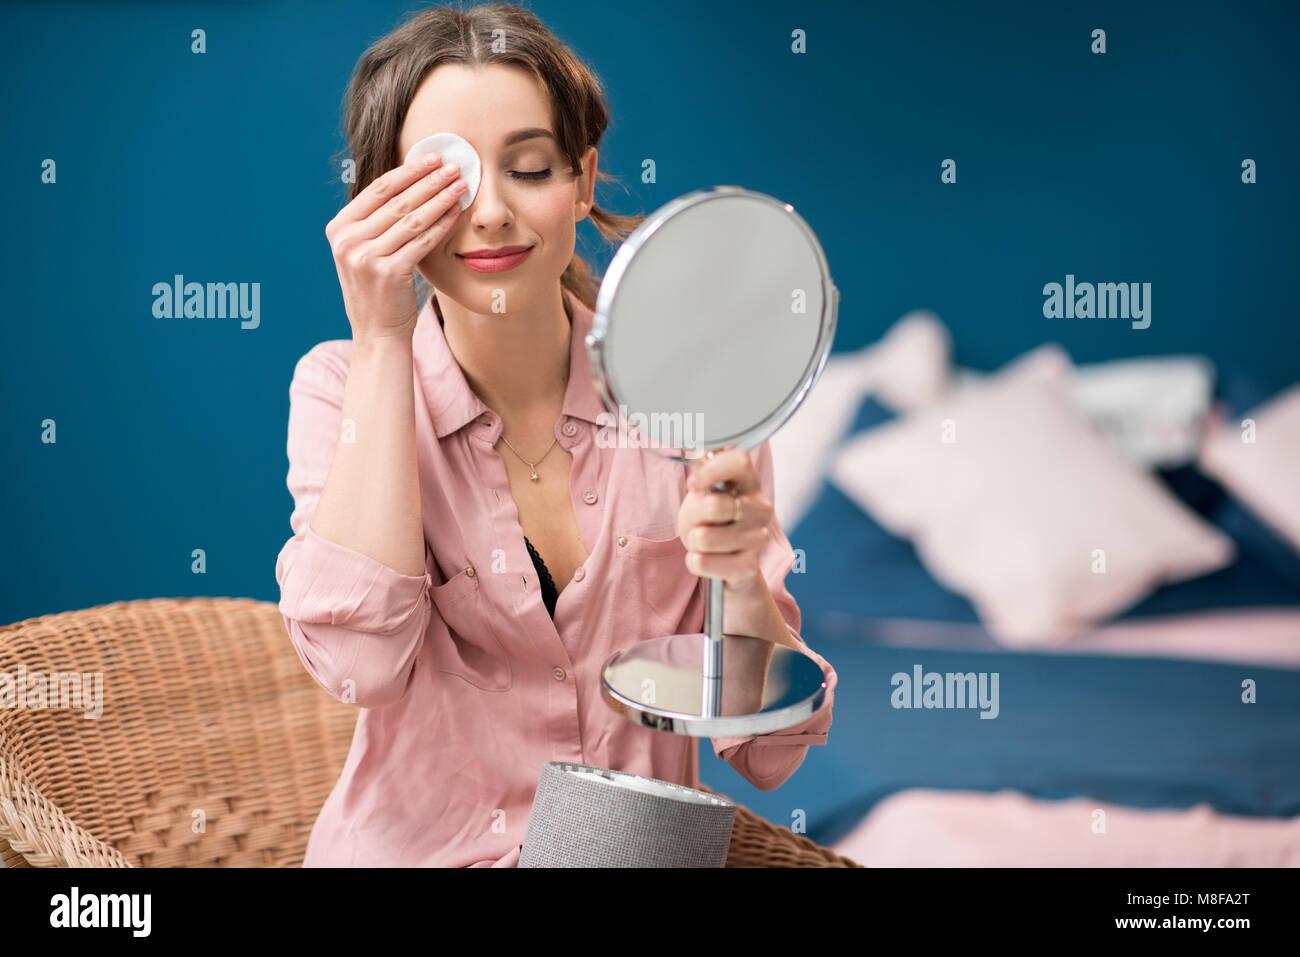 Woman using cotton swab indoors - Stock Image